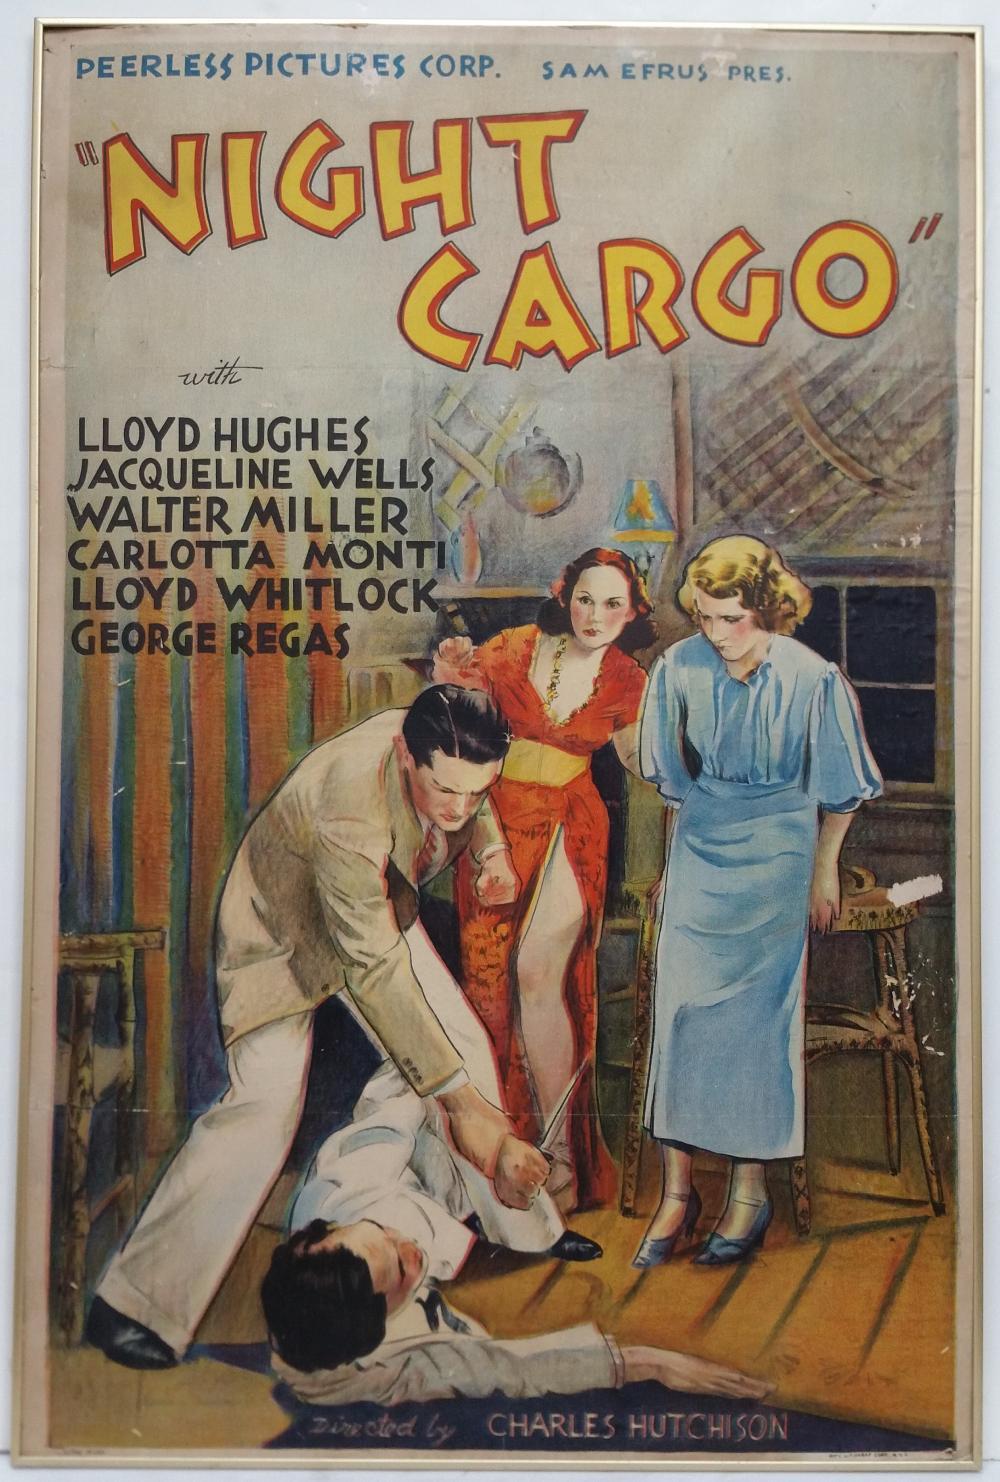 Original Night Cargo One Sheet Movie Poster Lithograph Estate Find Charles Hutchinson Lloyd Hughes Jacqueline Wells Walter Miller Carlotta Monti Lloyd Whitlock George Regas